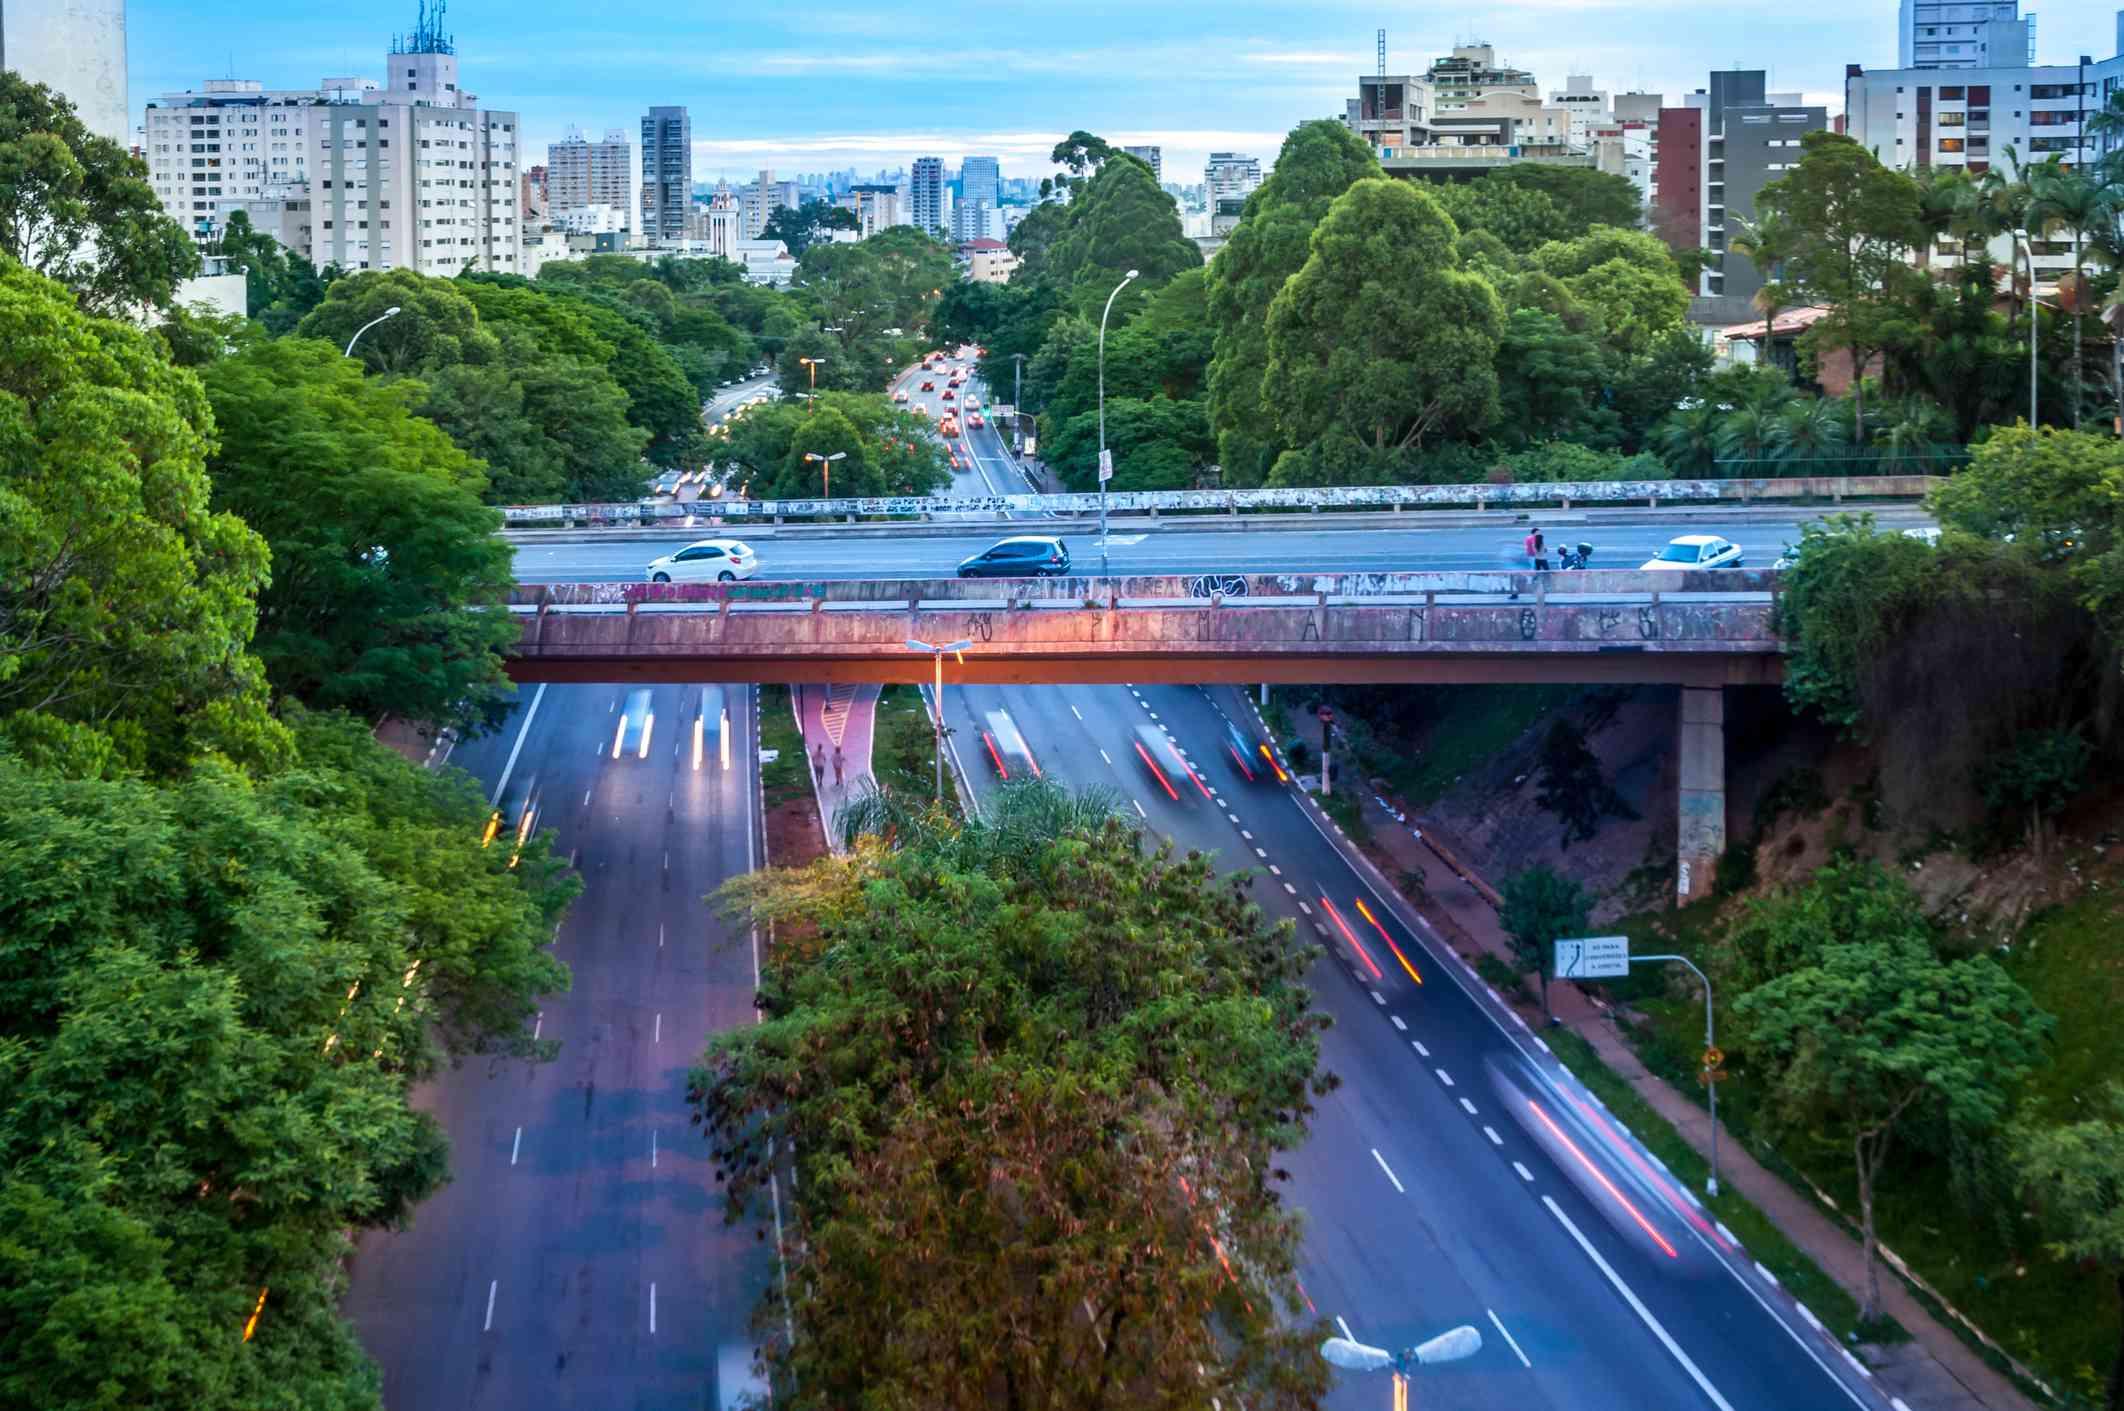 Famous Oscar Freire street, where it's a bridge over Paulo VI Avenue